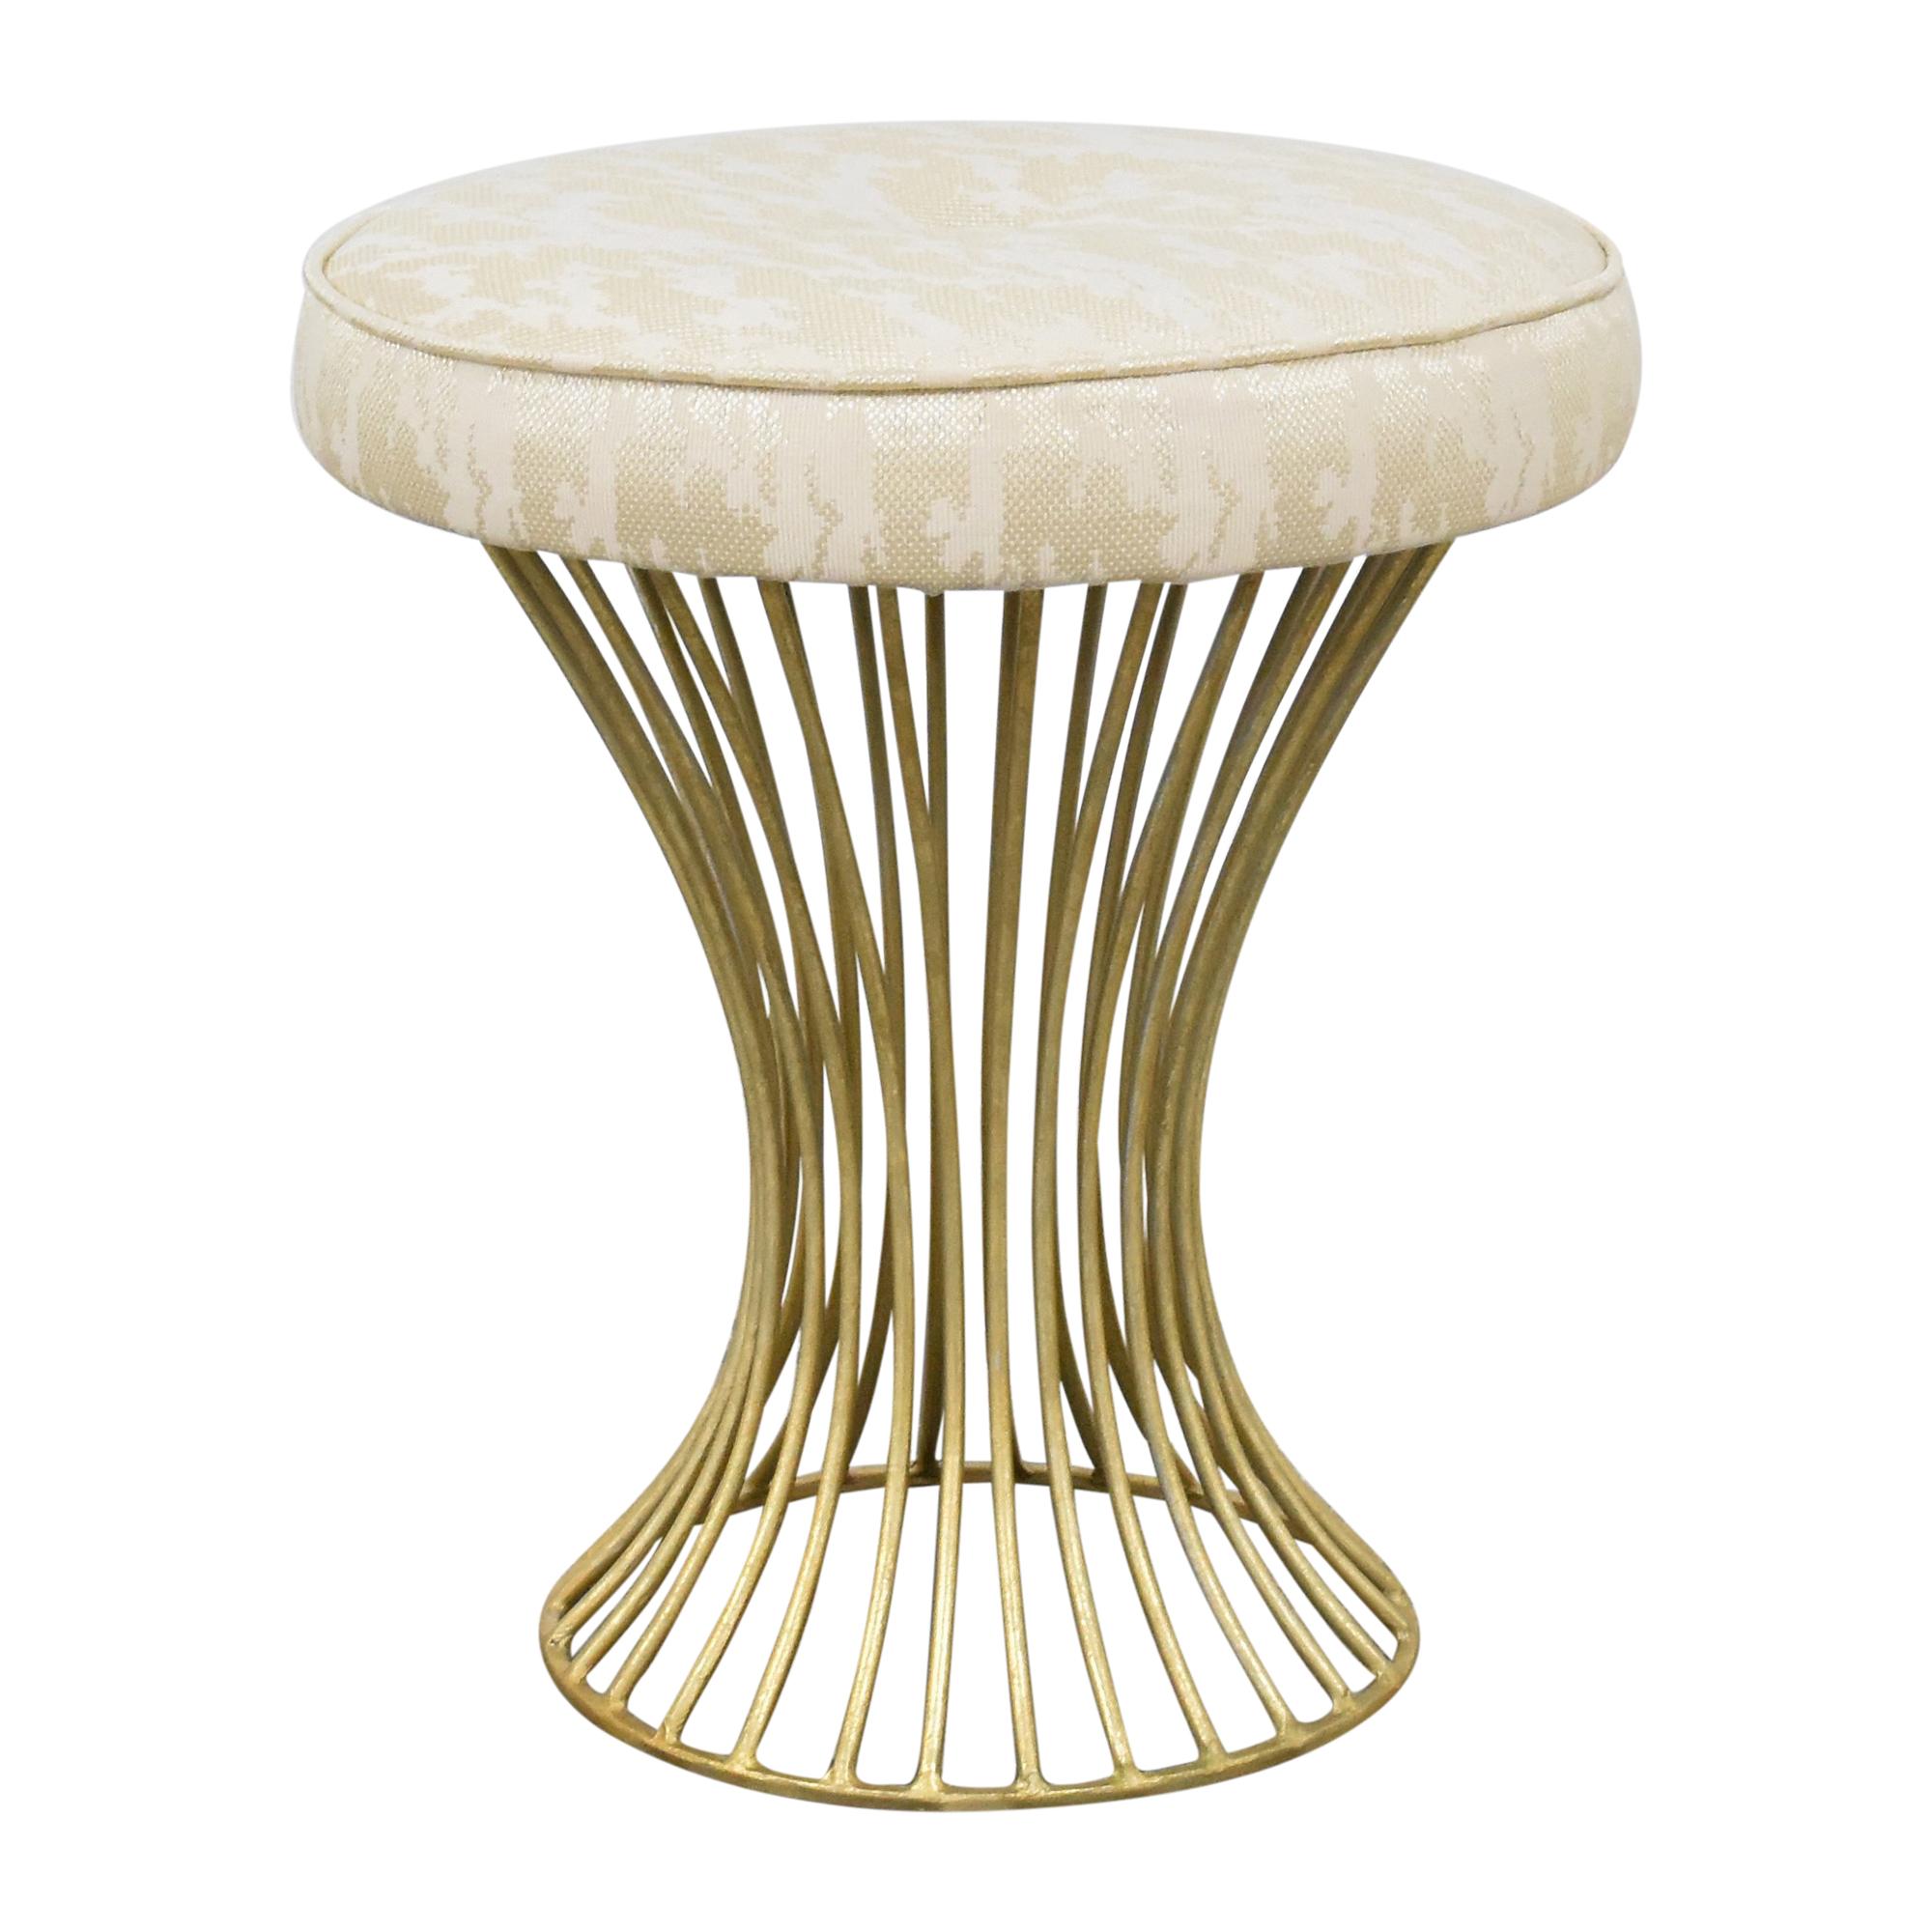 Made Goods Roderic Round Stool / Chairs